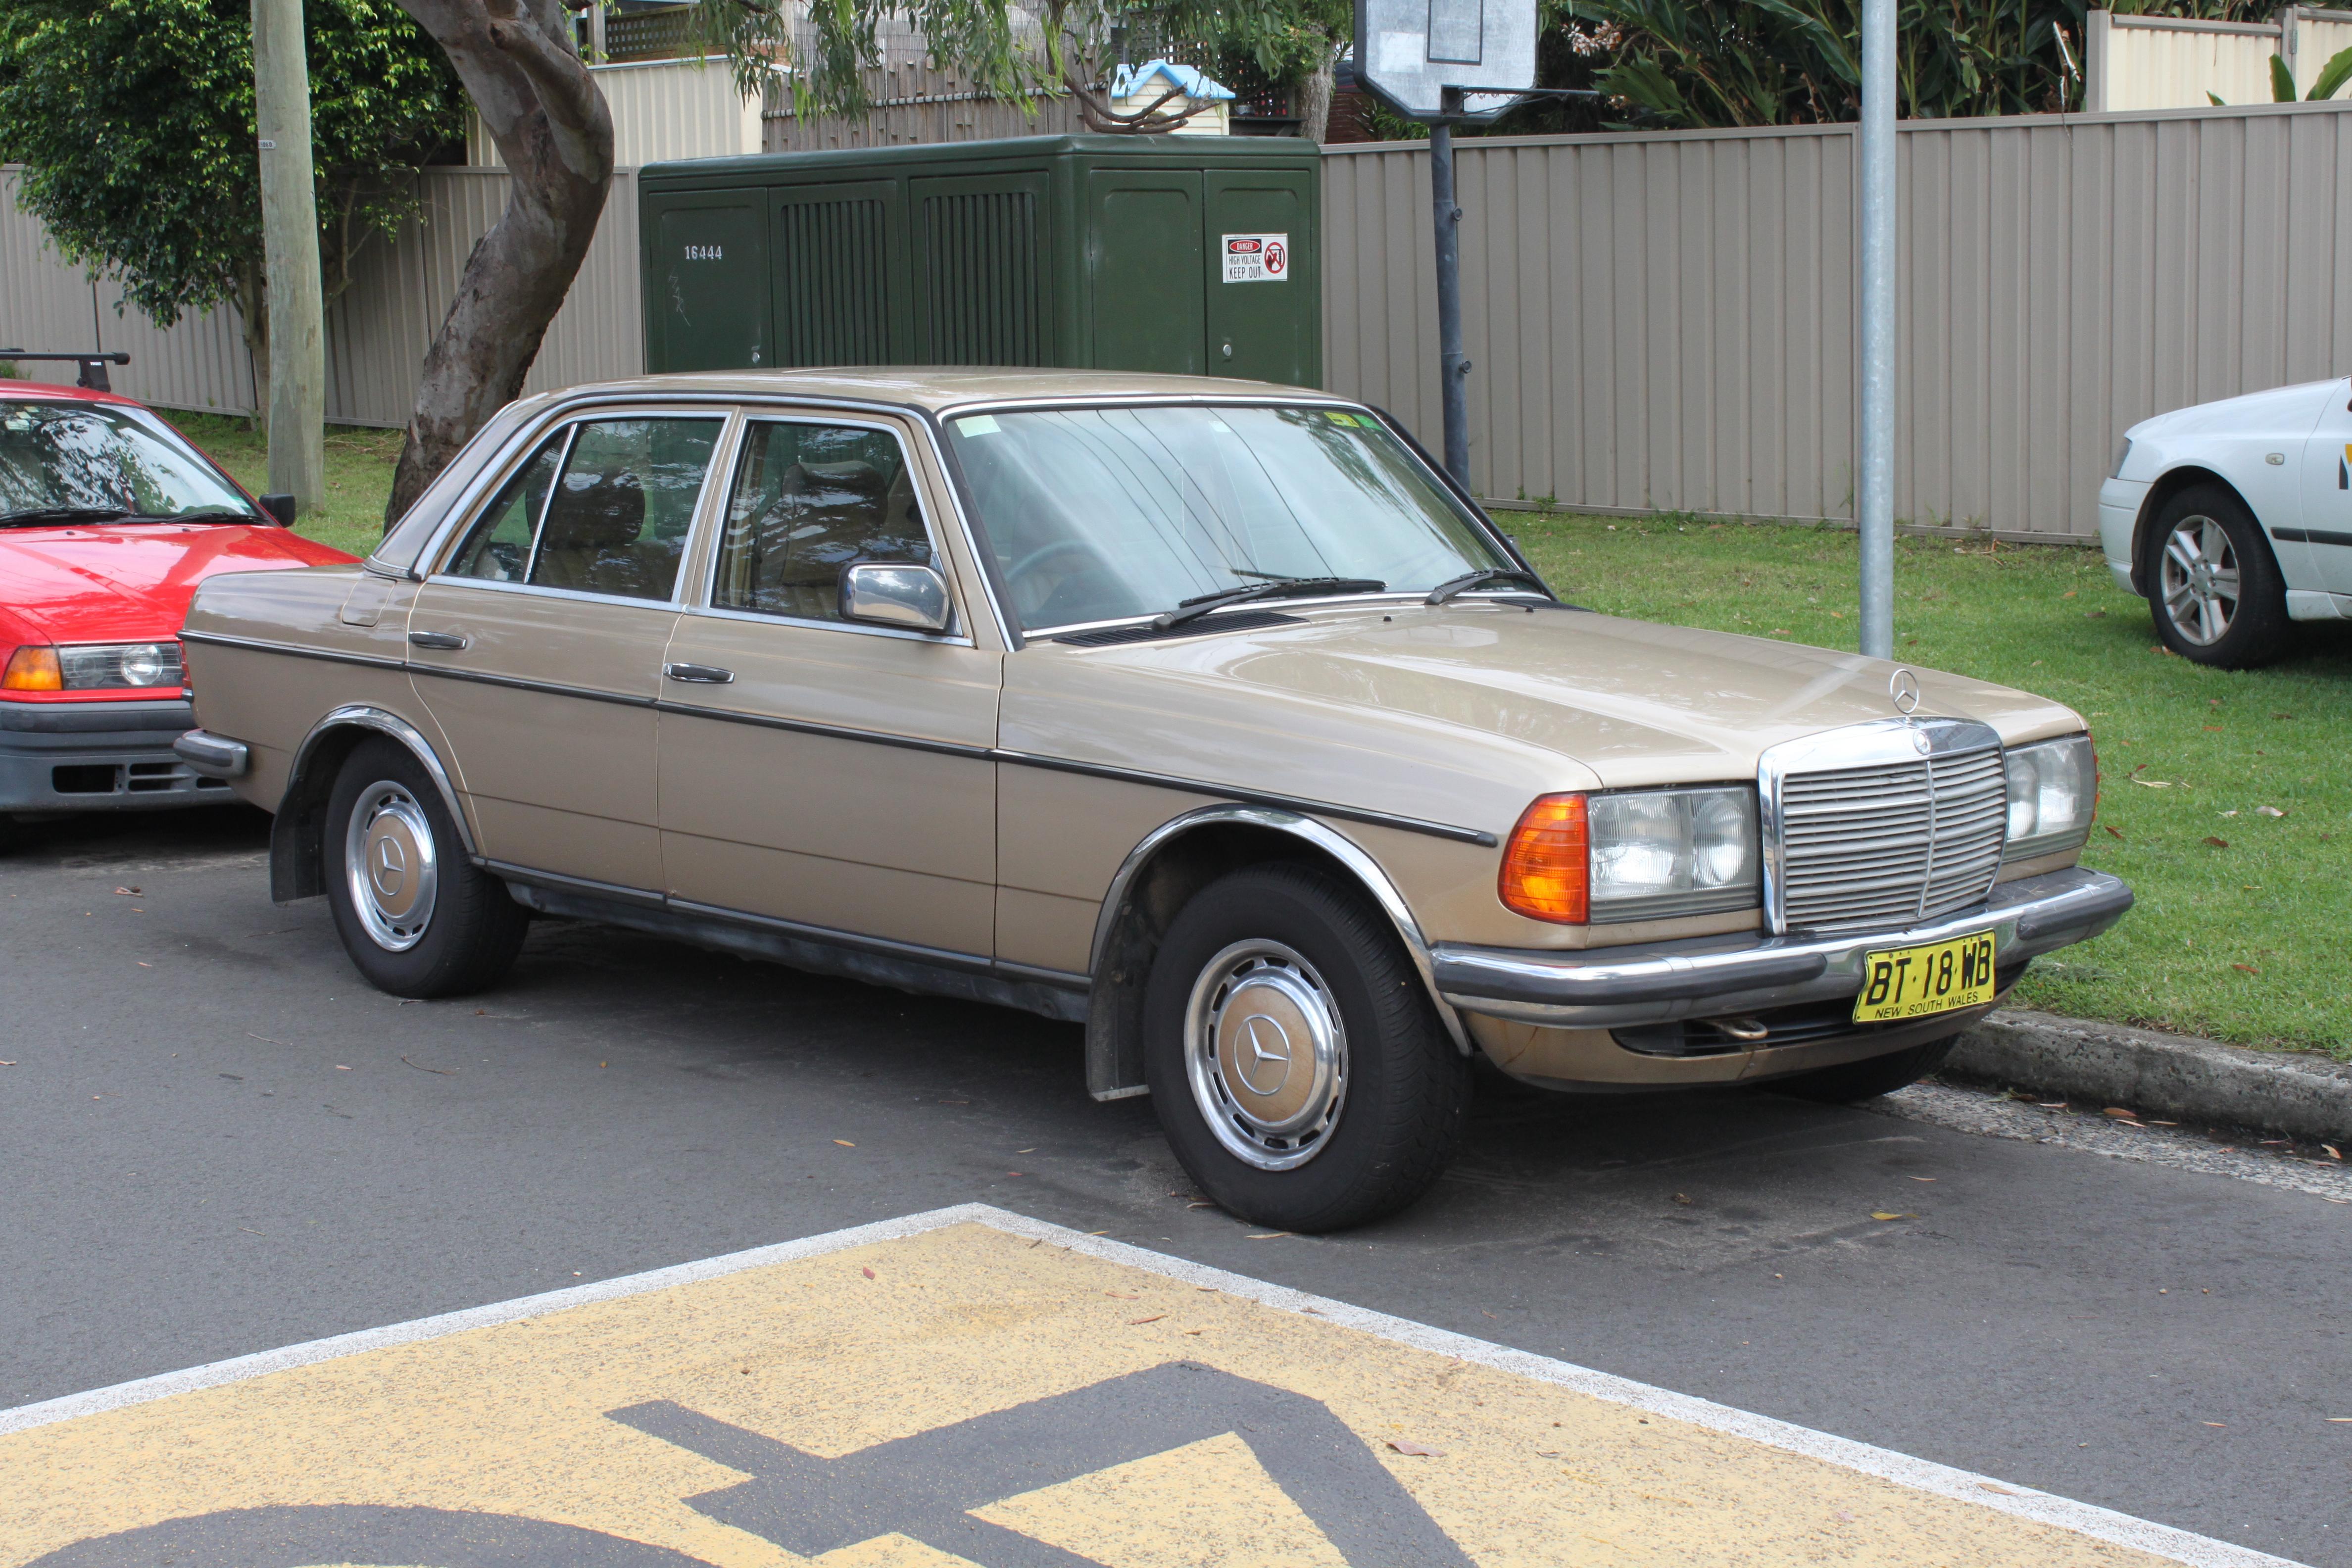 dee21e7047 File 1984 Mercedes-Benz 280 E (W123) sedan (23175827566).jpg ...